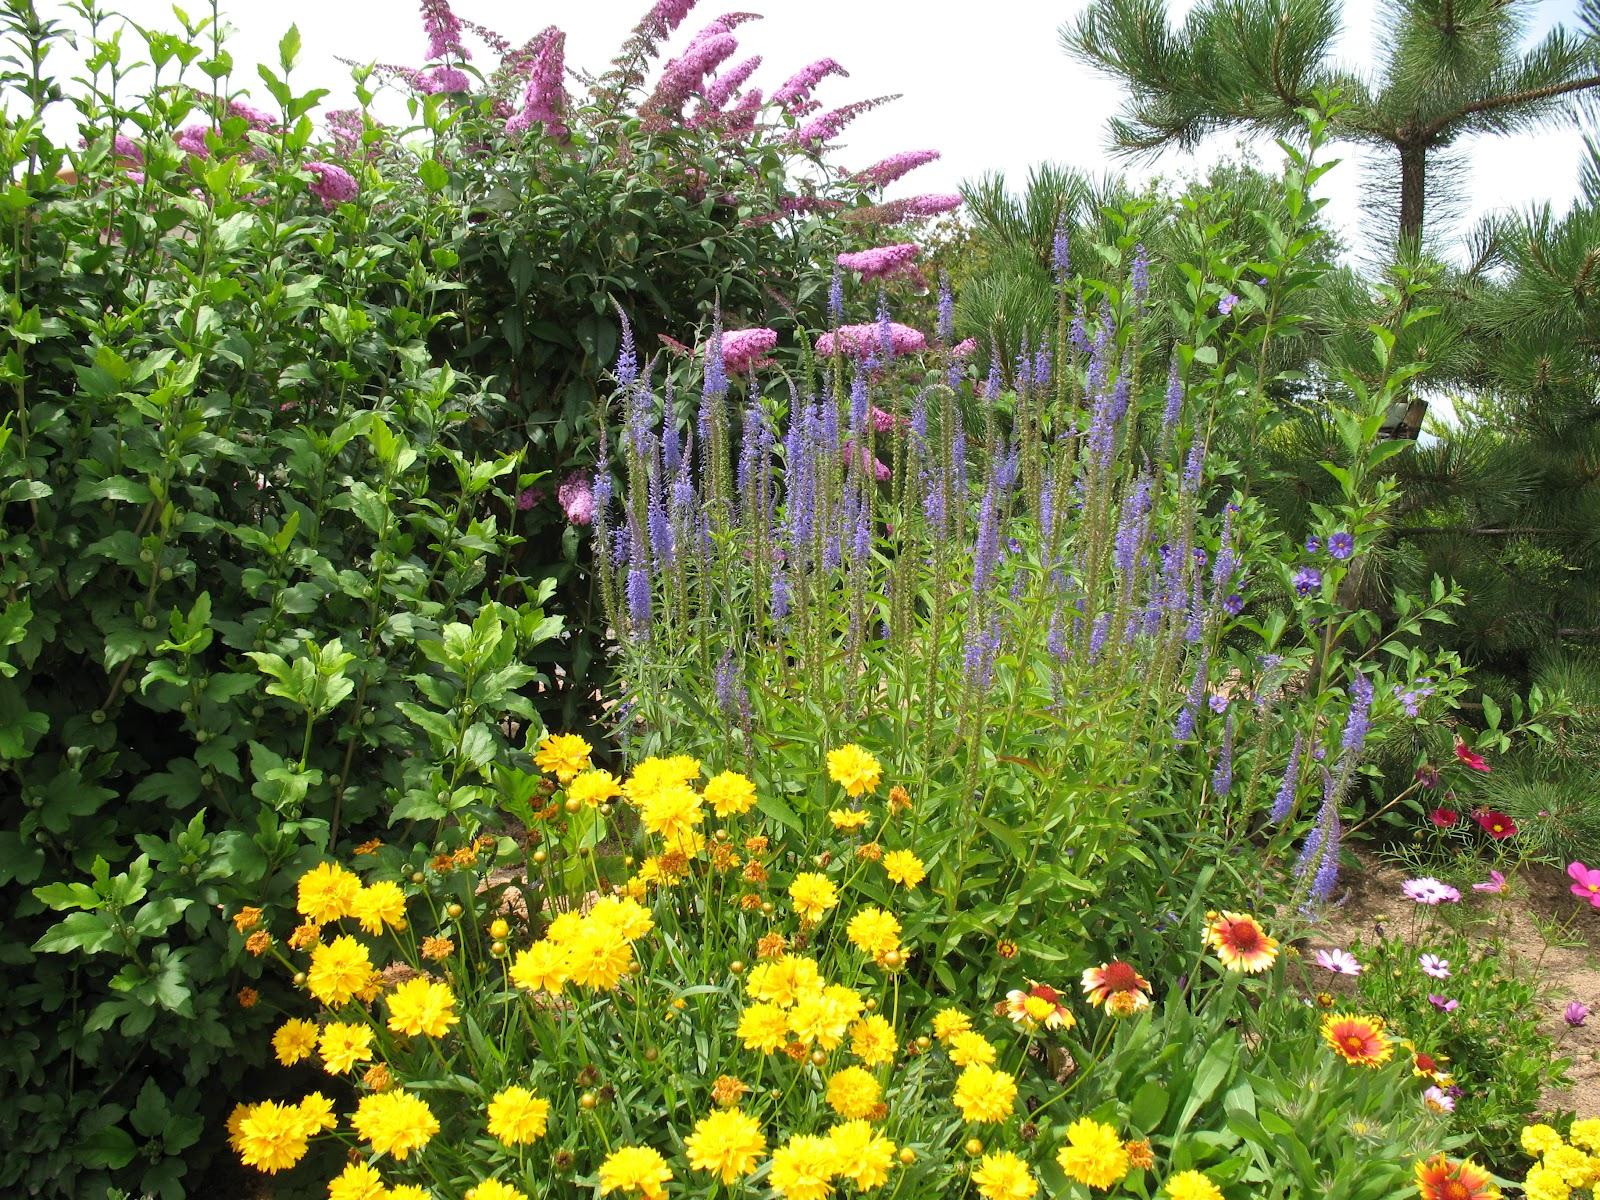 Roses du jardin ch neland cor opsis sonnenkind - Jardin de chen ...